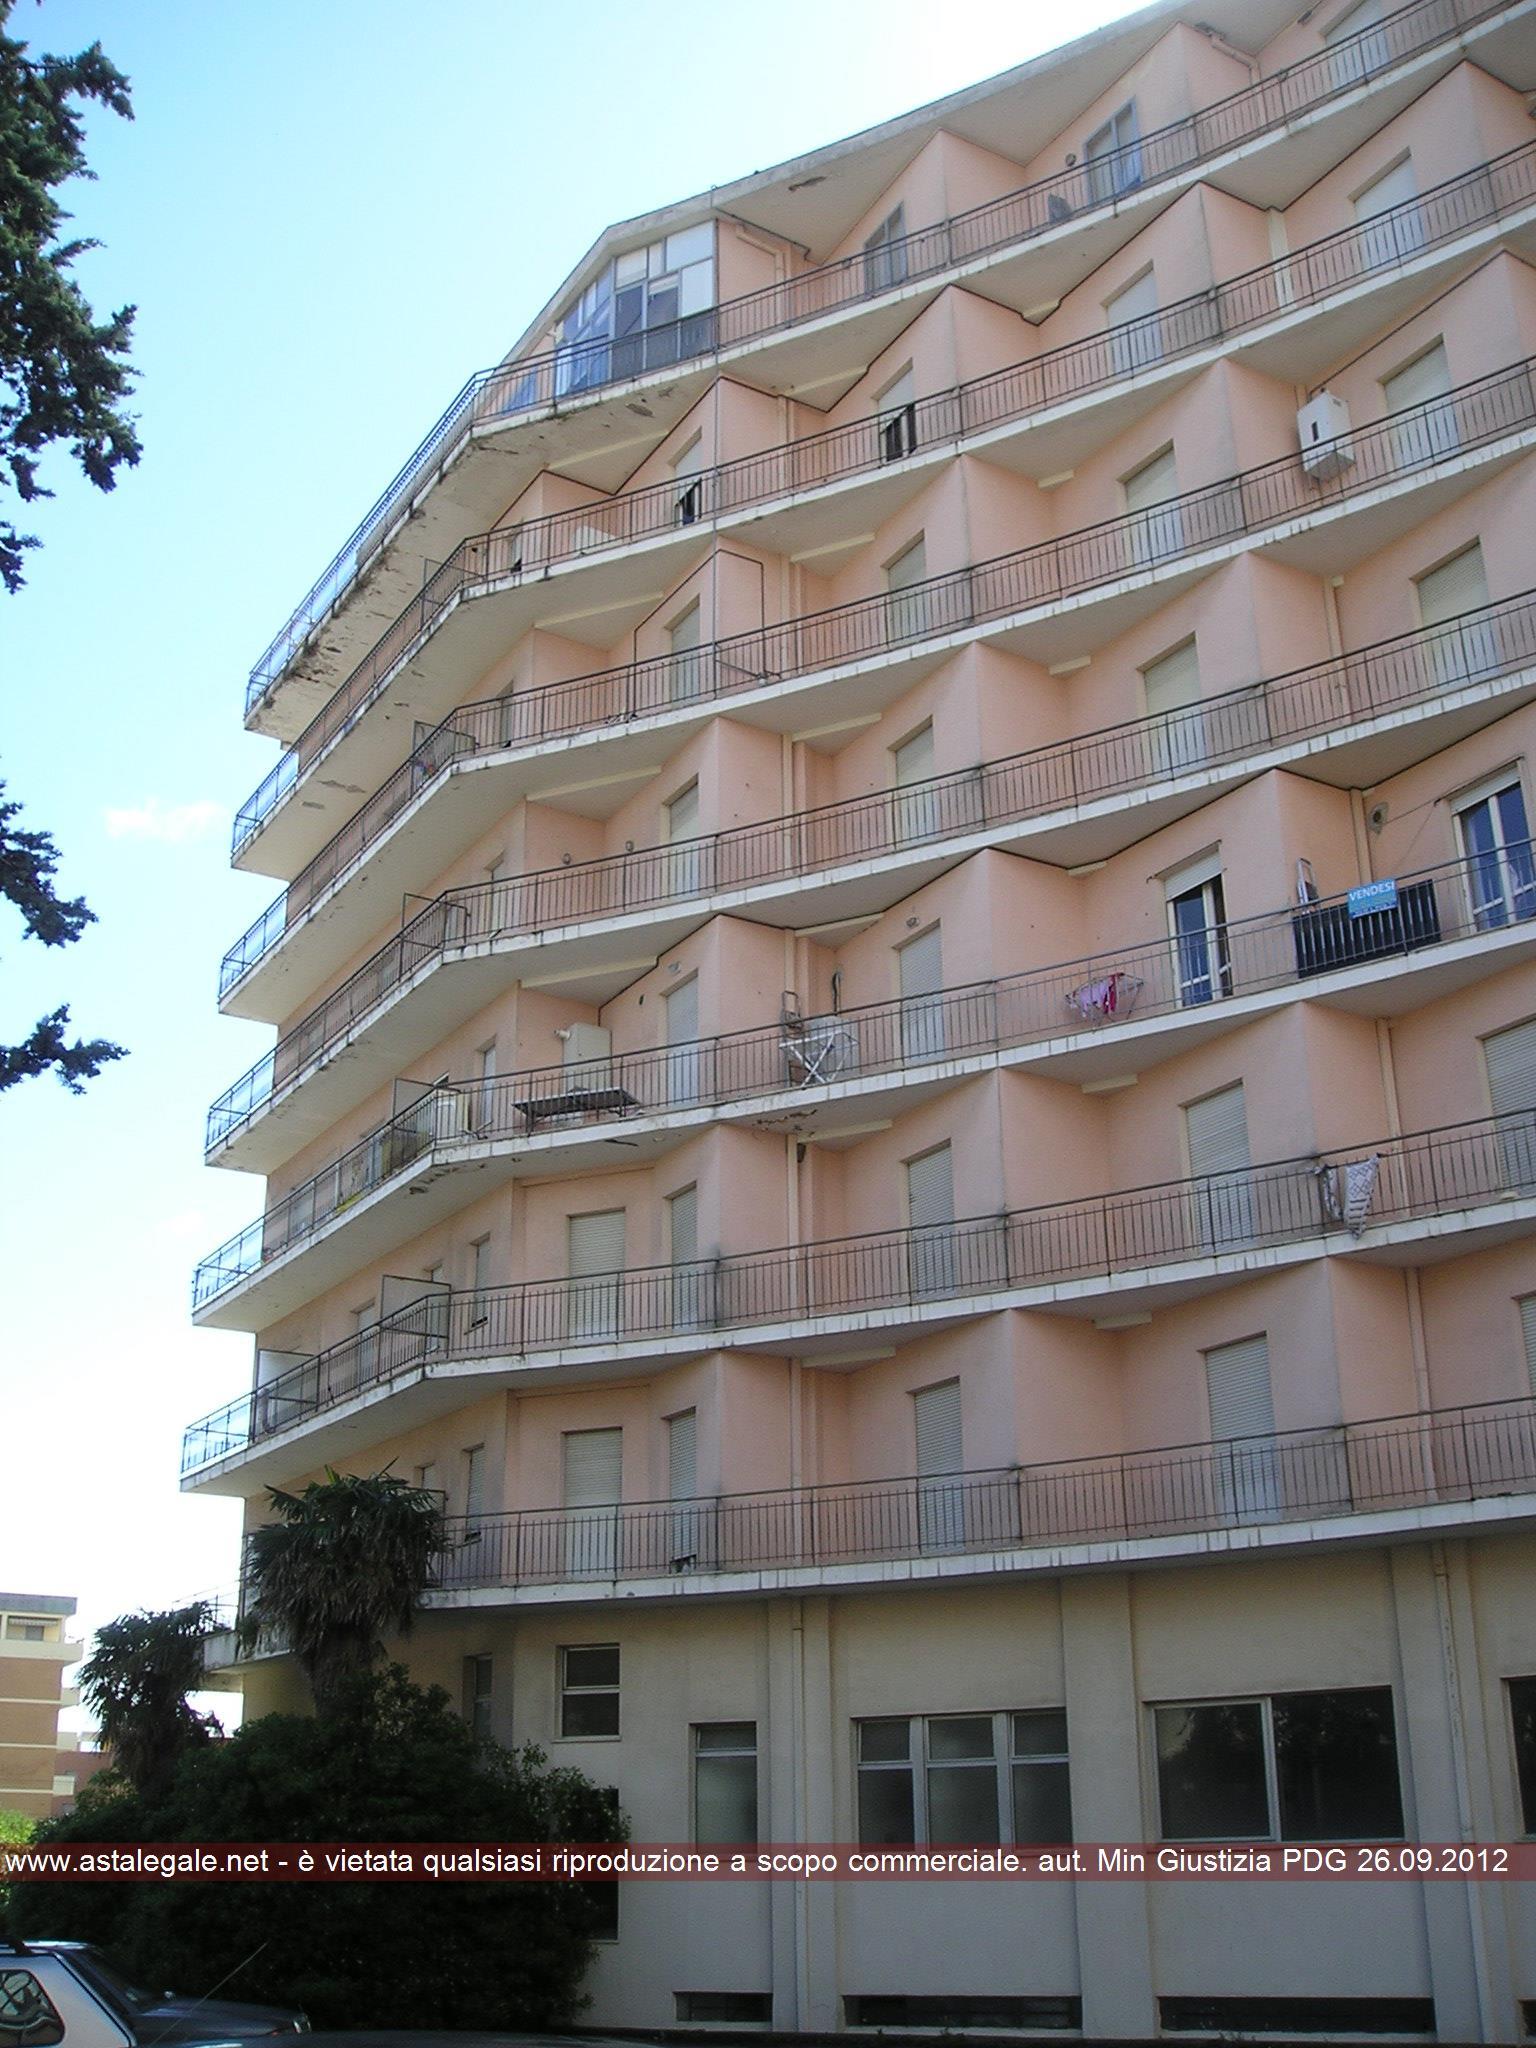 Porto Recanati (MC) Viale DEI PINI 5